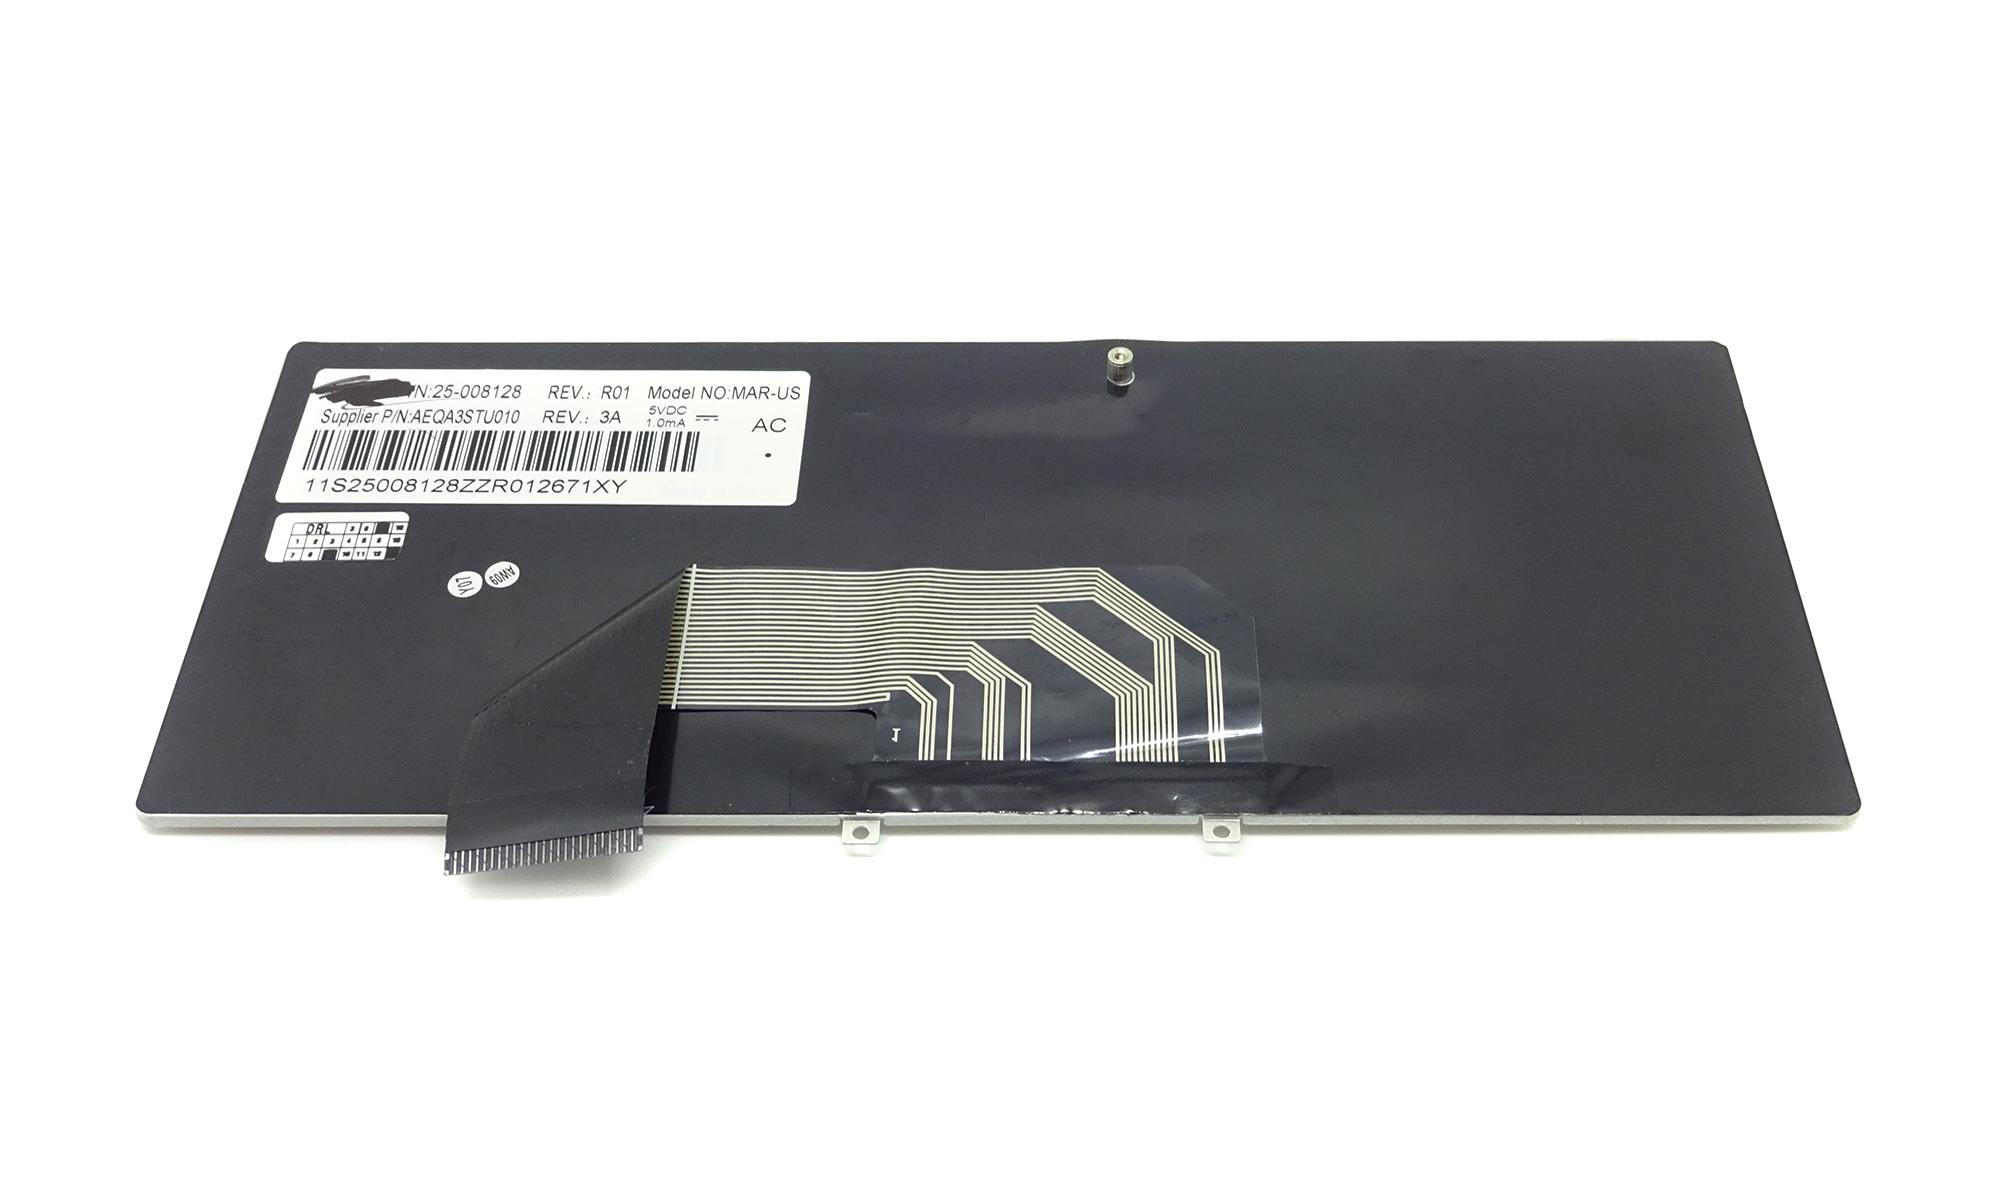 Tastatura Lenovo IdeaPad S9, S9E, S10, S10E, alba